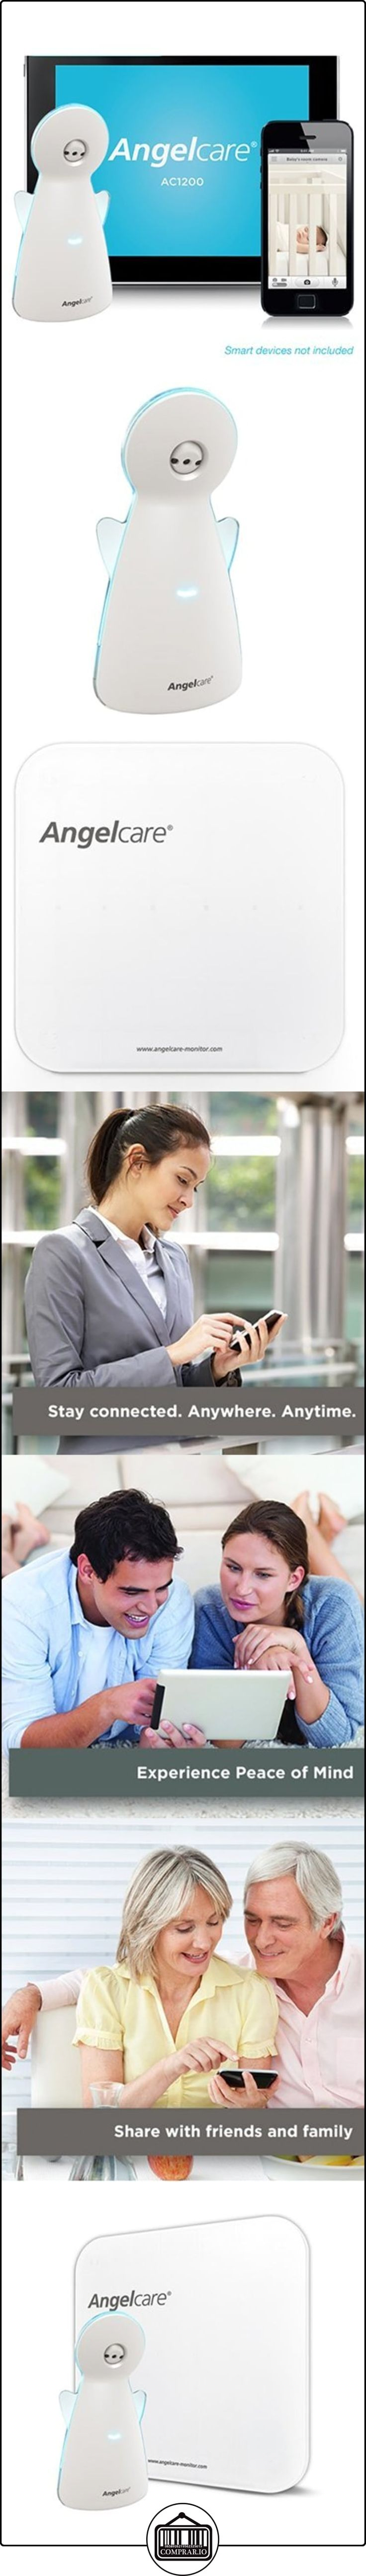 Angelcare  - Intercomunicador digital angel care ac1200 - smartphone blanco  ✿ Vigilabebés - Seguridad ✿ ▬► Ver oferta: http://comprar.io/goto/B00Q8J3G58